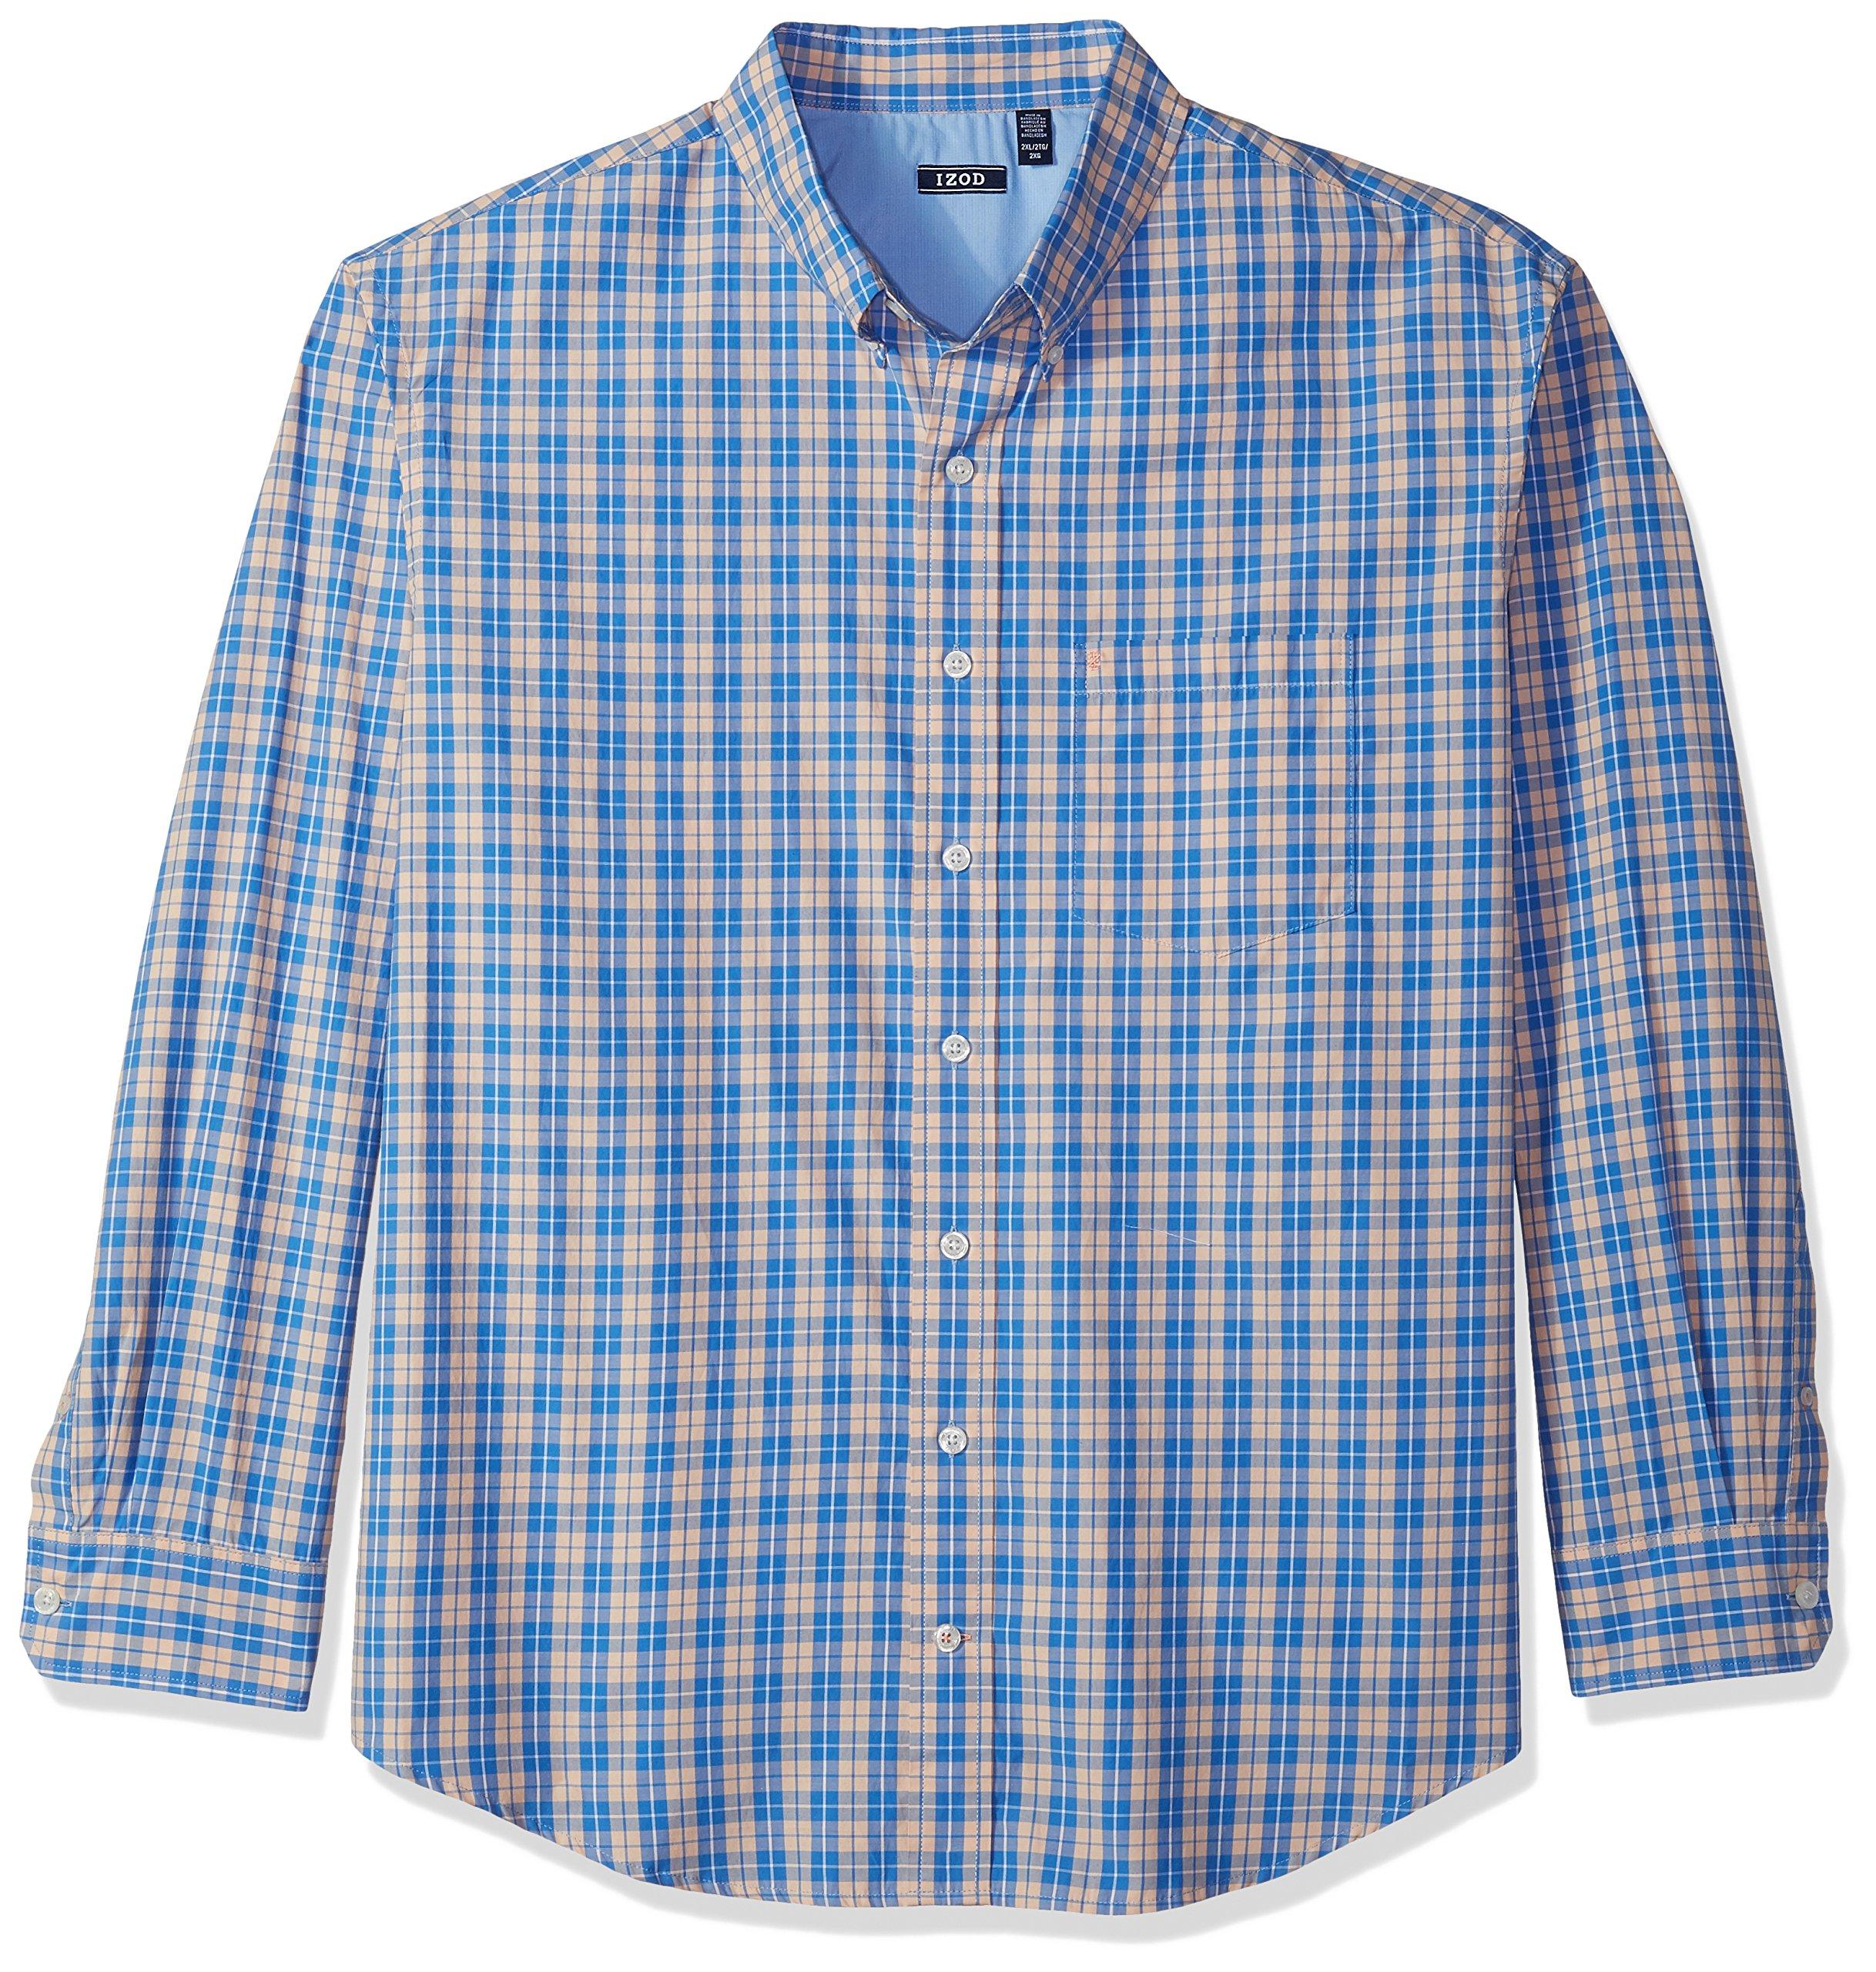 IZOD Men's Big and Tall Saltwater Breeze Plaid Long Sleeve Shirt, Peach Parfait, 3X-Large by IZOD (Image #1)